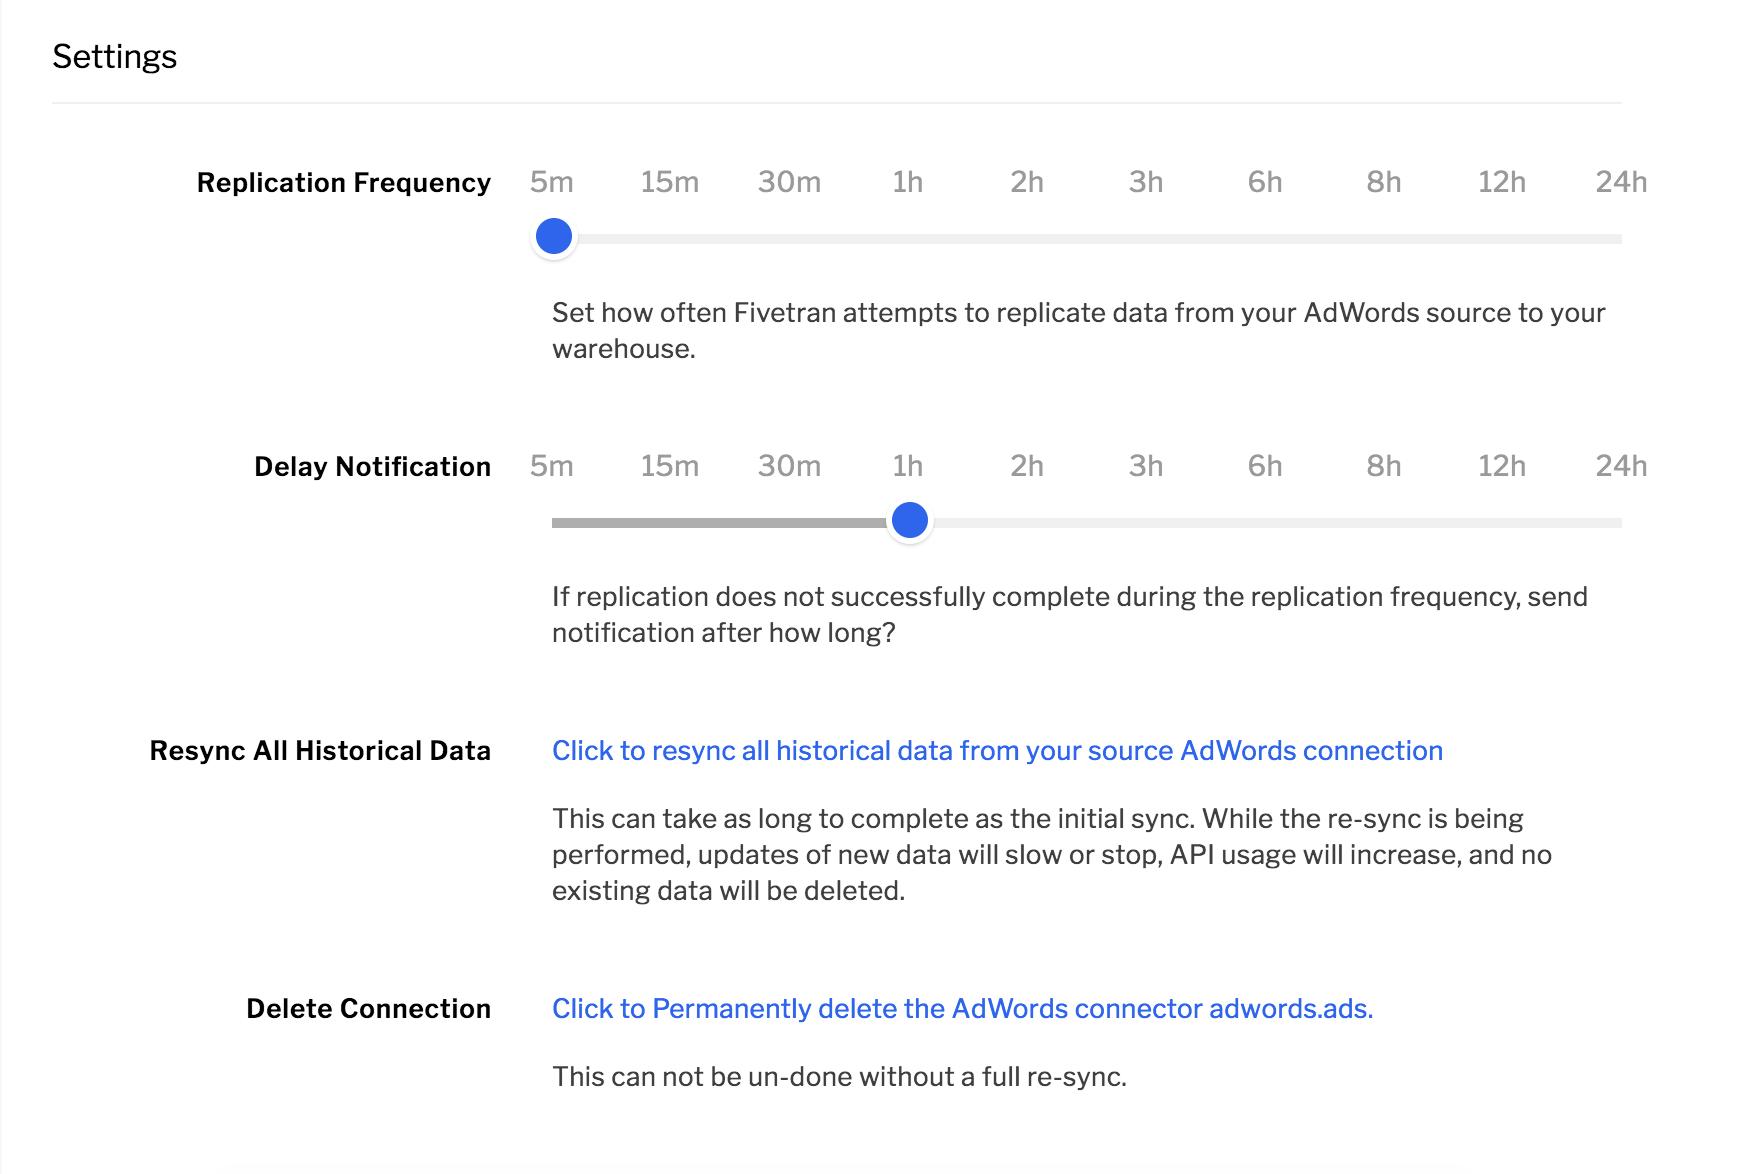 Fivetran - Data replication process